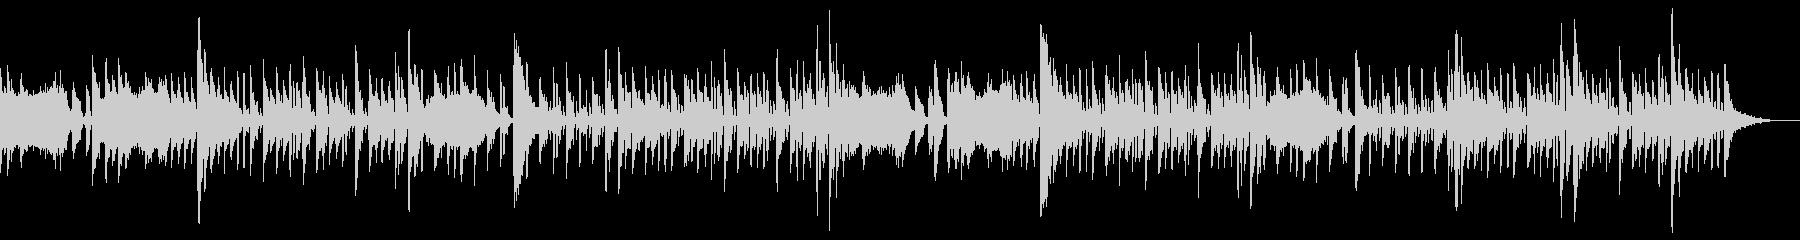 LUNARTICパルステクノポップの未再生の波形